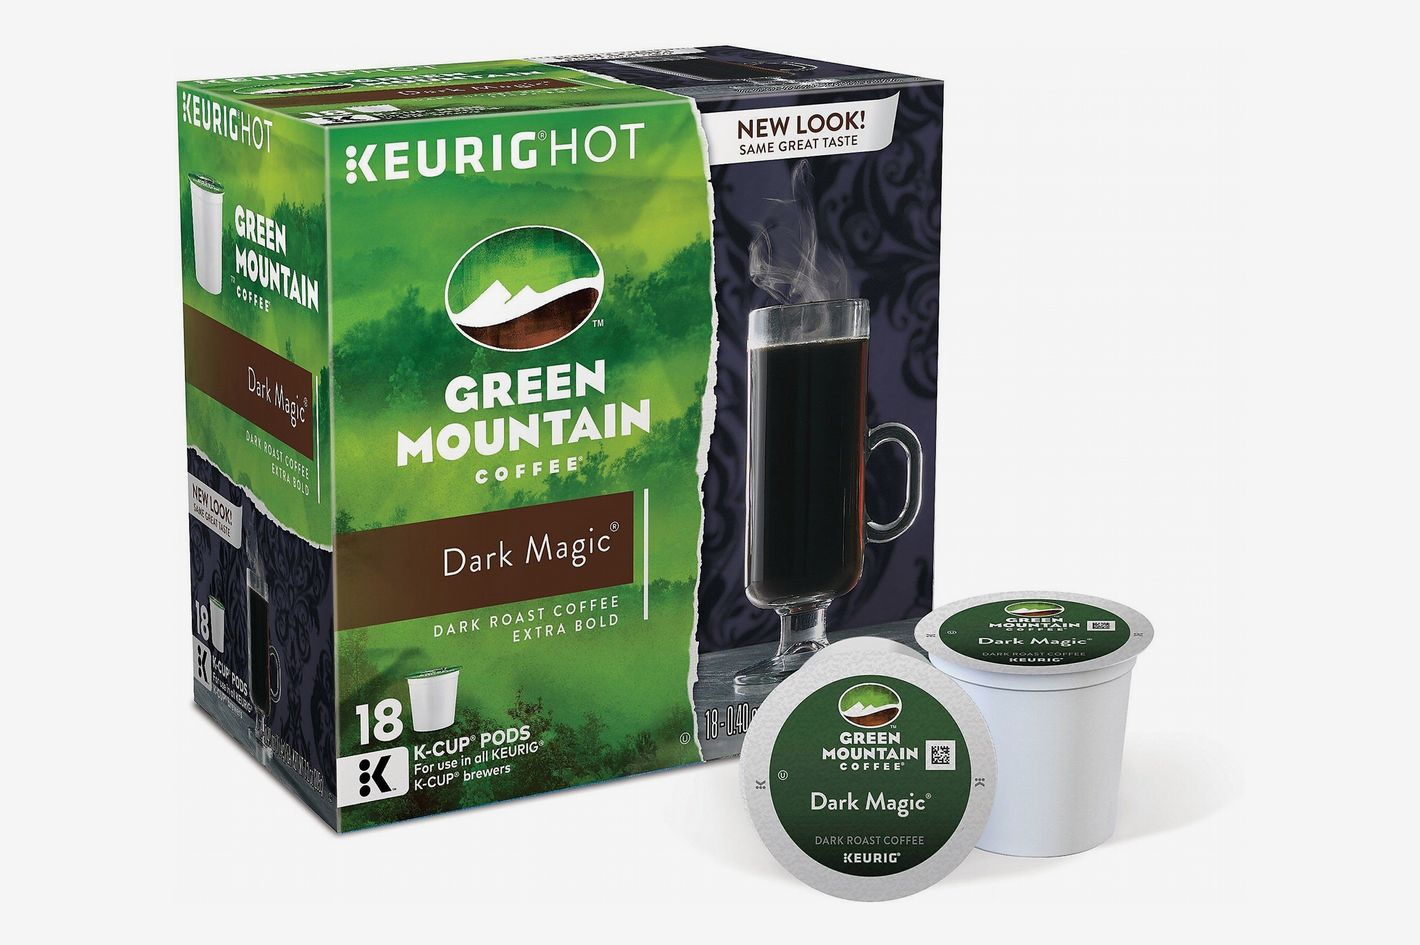 Green Mountain Coffee Dark Roast Single Serve for Keurig, Dark Magic, 18-Count